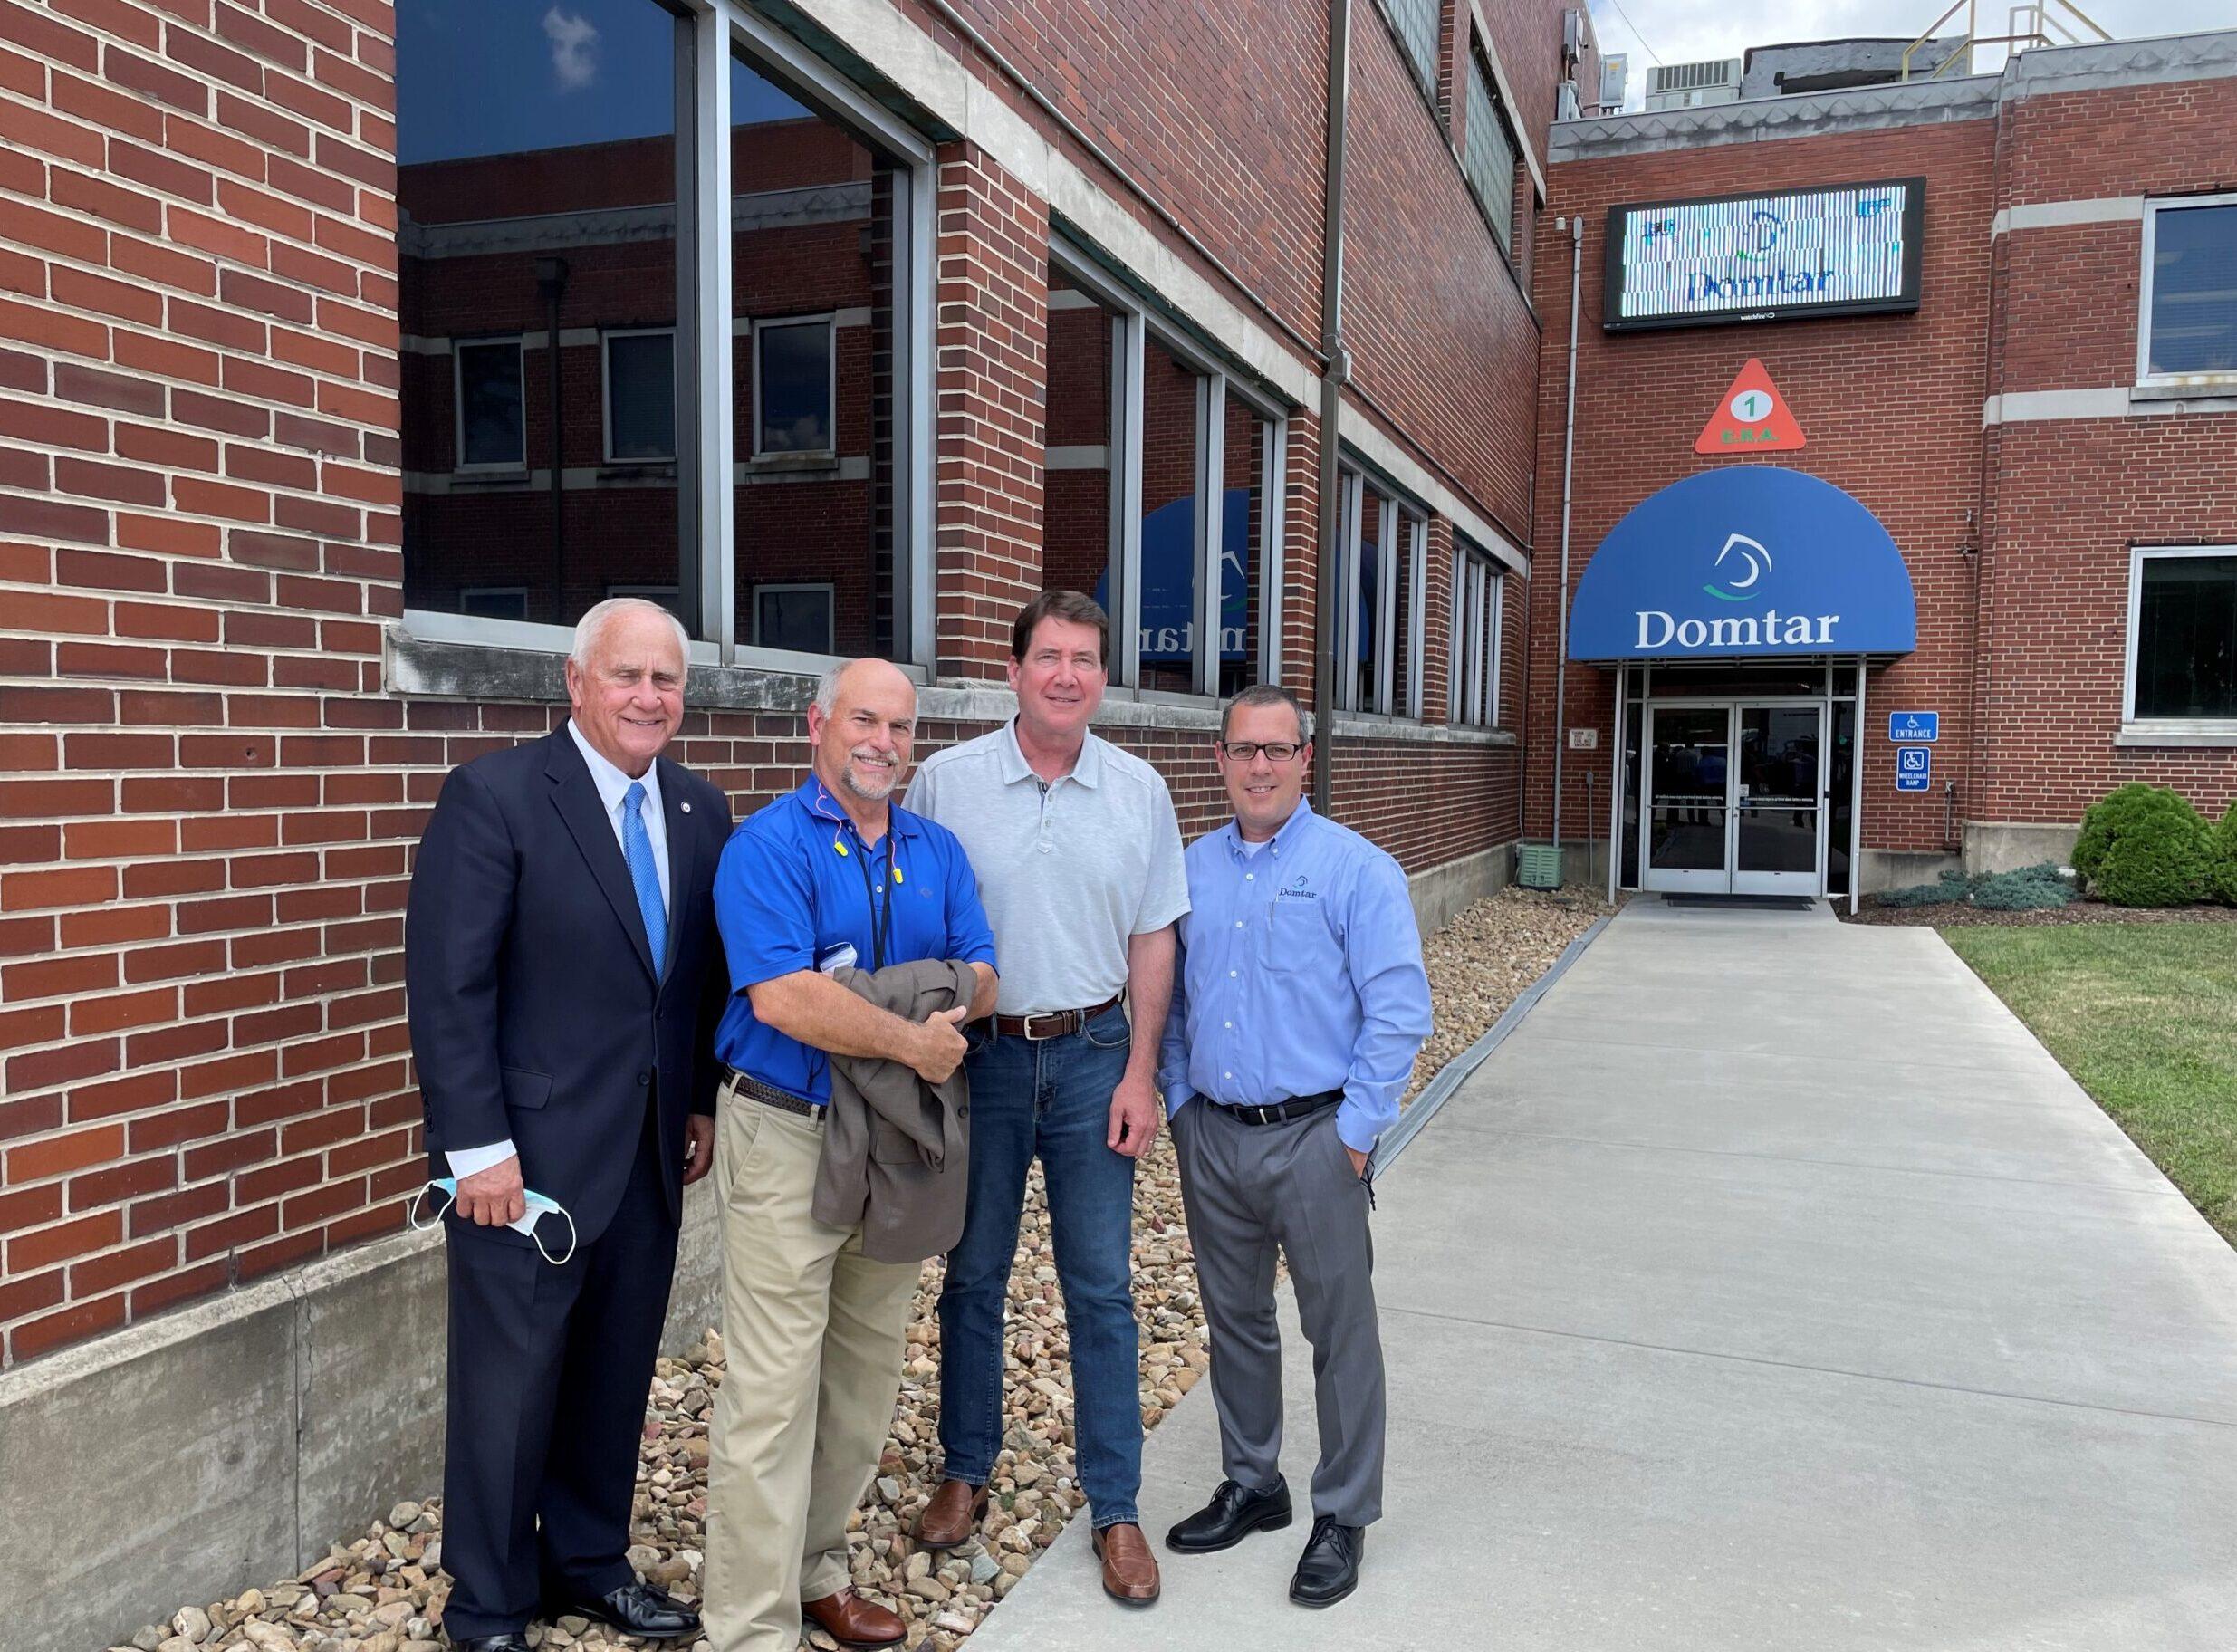 senator visits Kingsport Mill conversion site